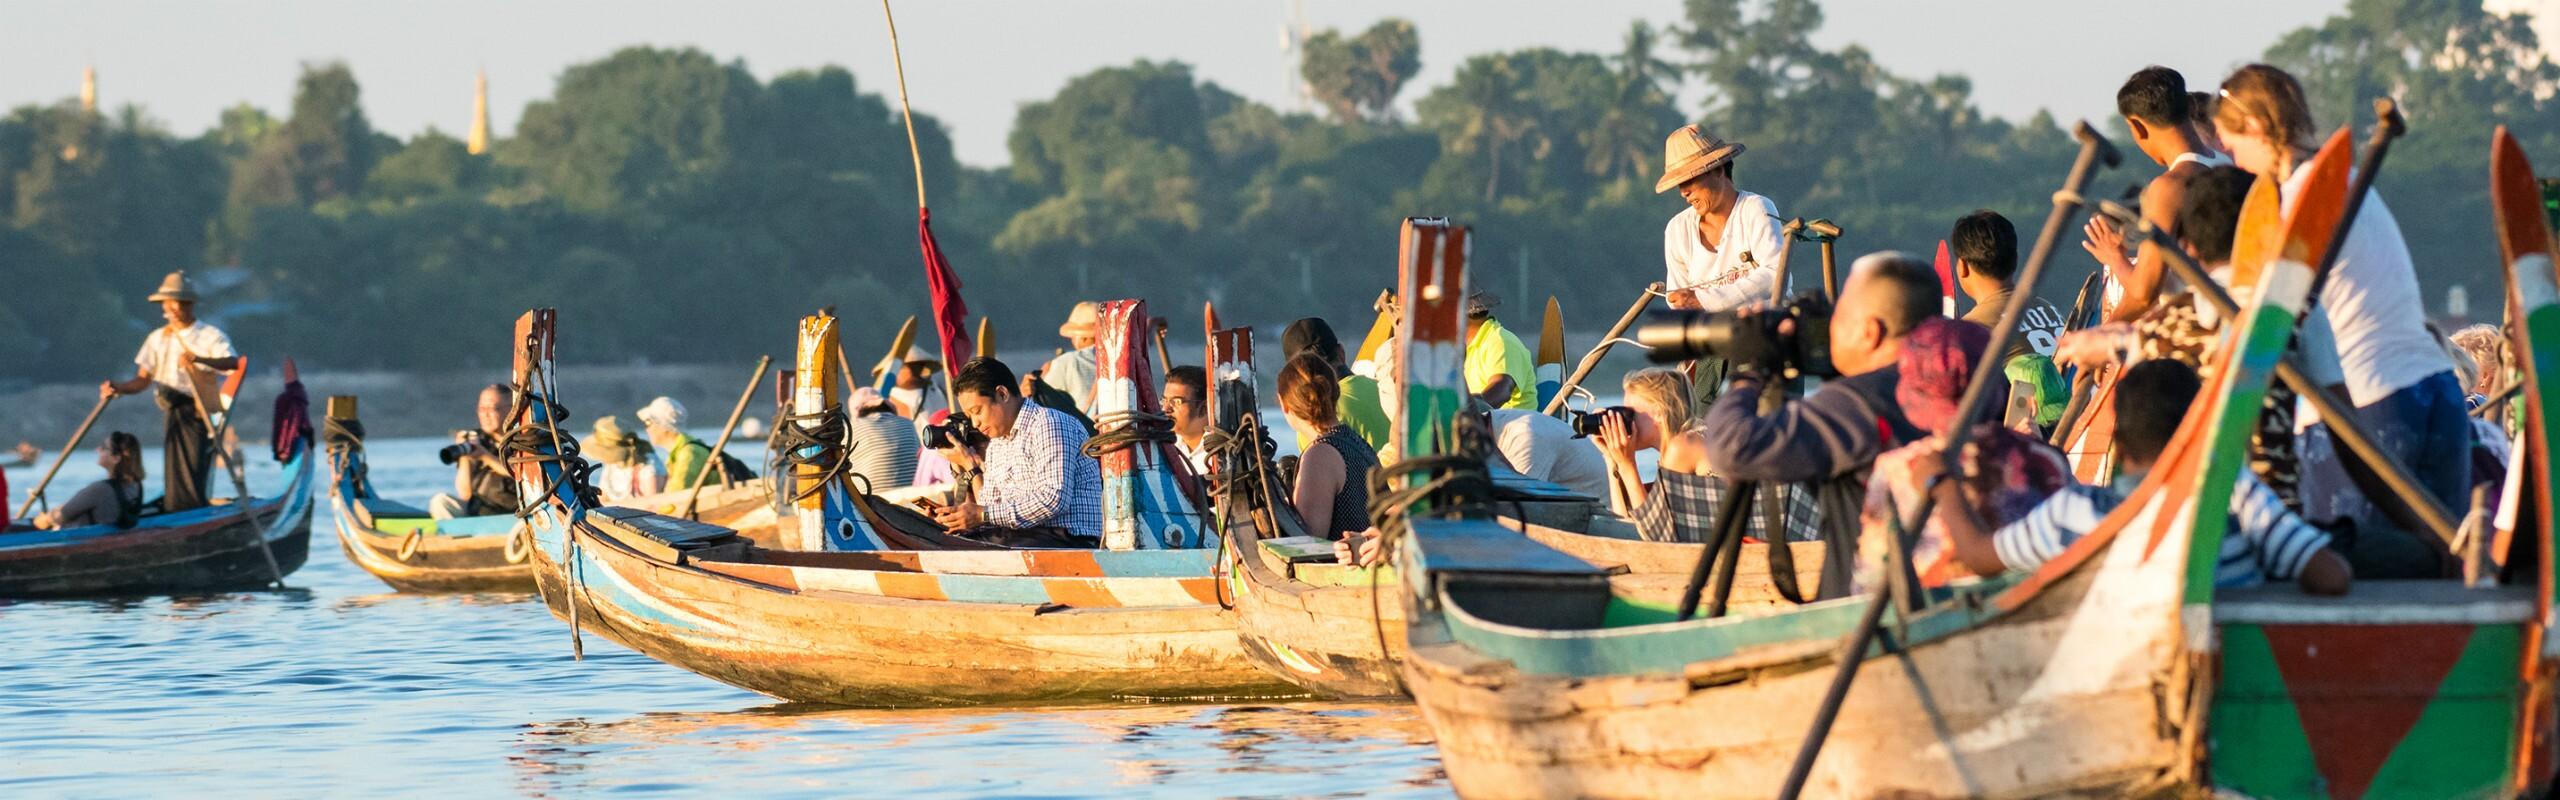 Top 7 Things to Do in Mandalay - Cross The World's Longest Teakwood Bridge